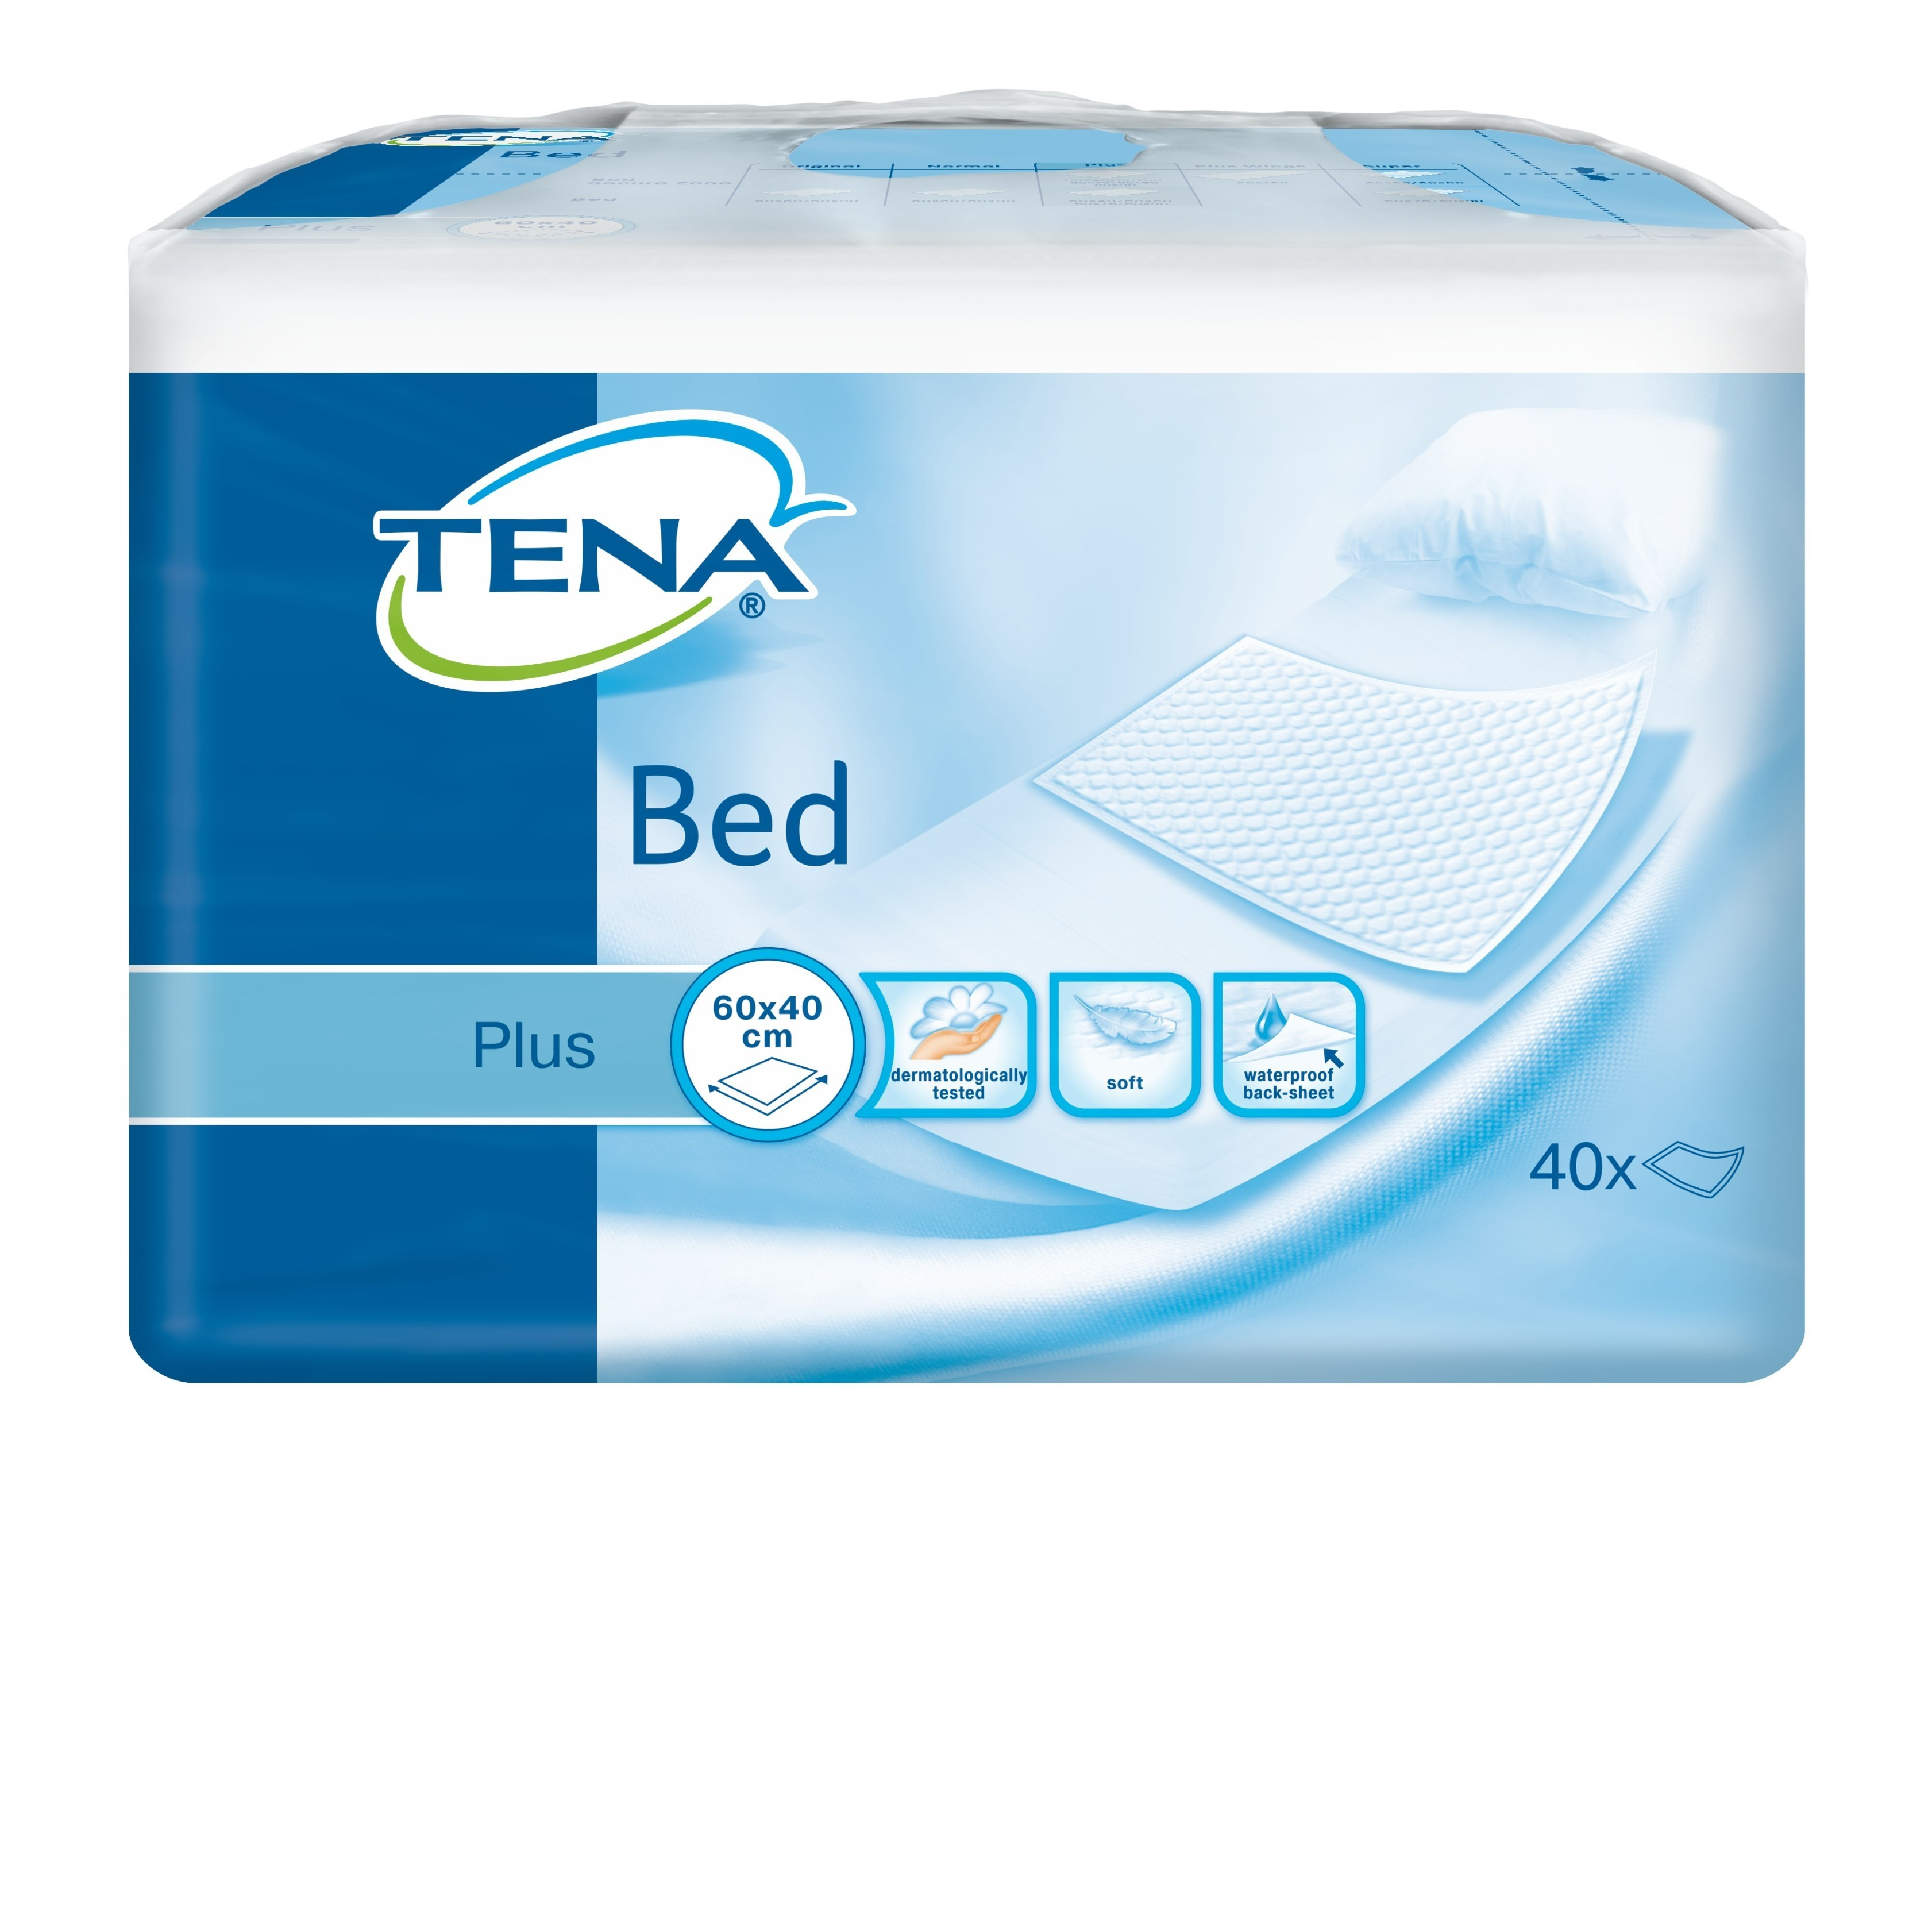 Tena Onderleggers Bed Plus 40cmx60cm